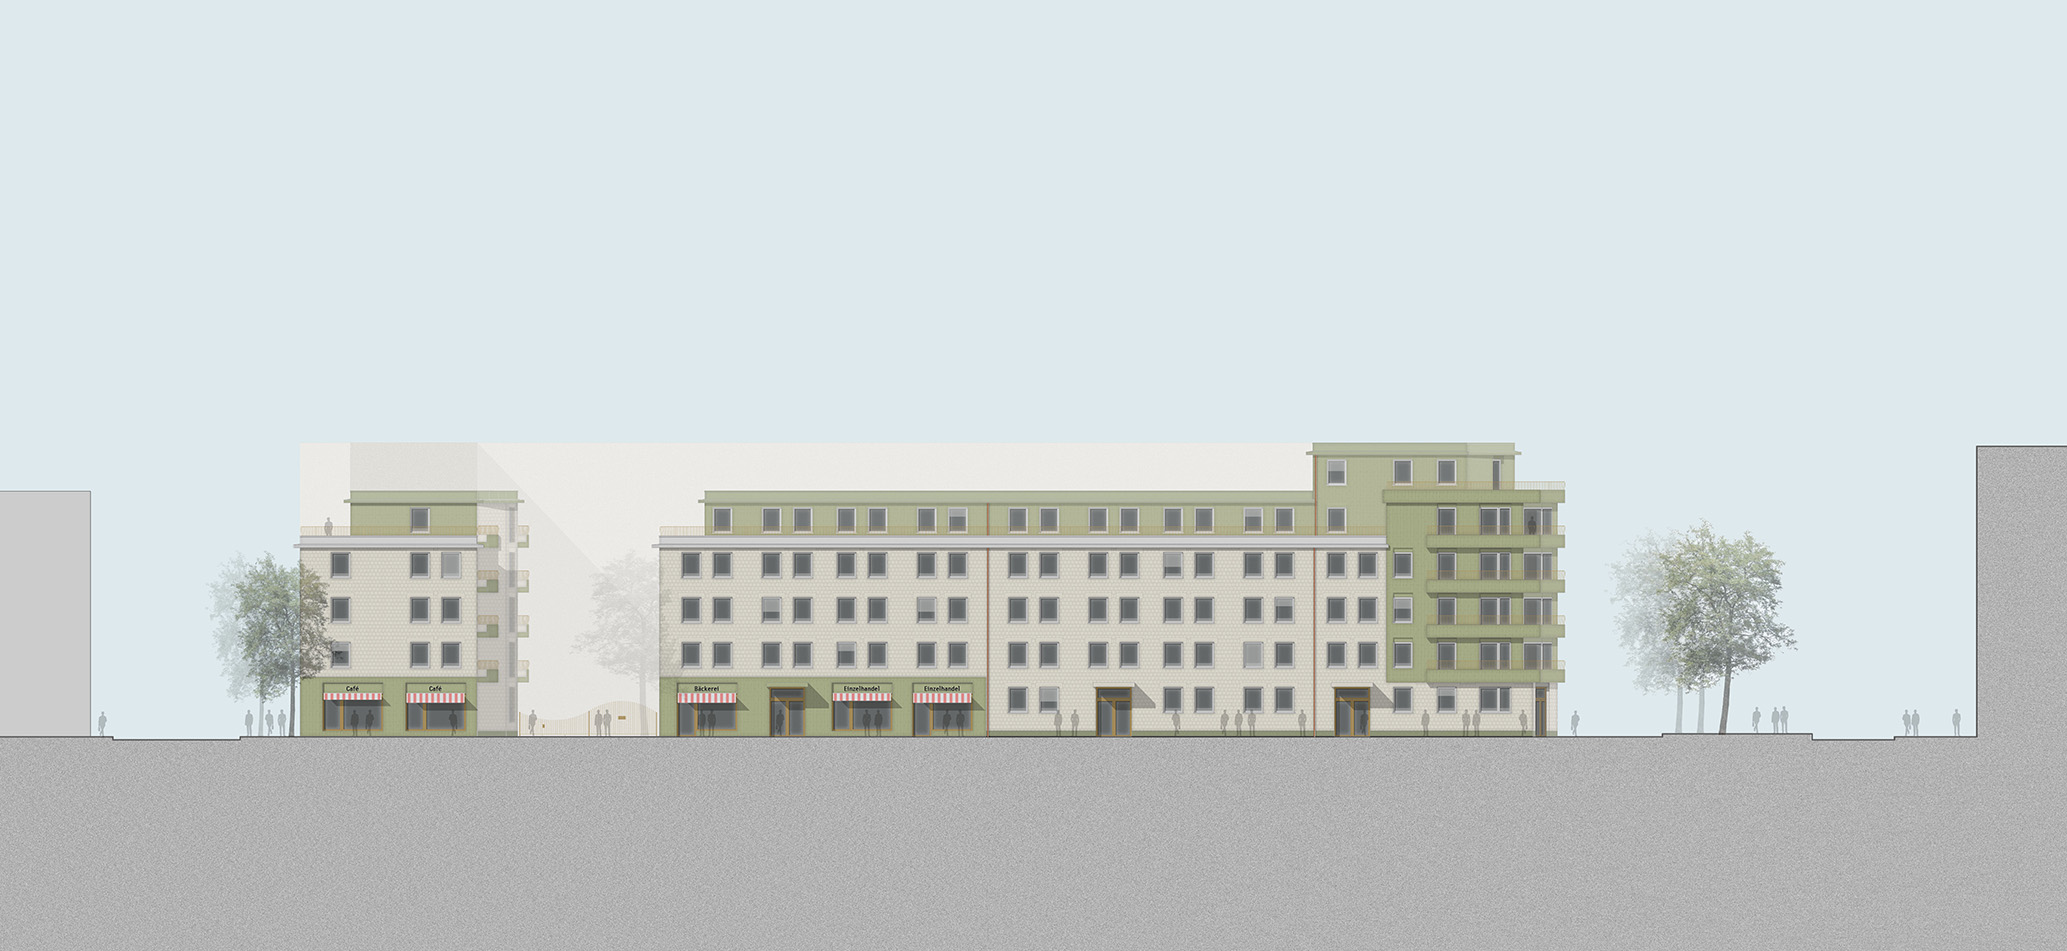 Am Weinberg Ulm Wettbewerb Wohnungsbau dreisterneplus Meili Peter Wohnbaumodul